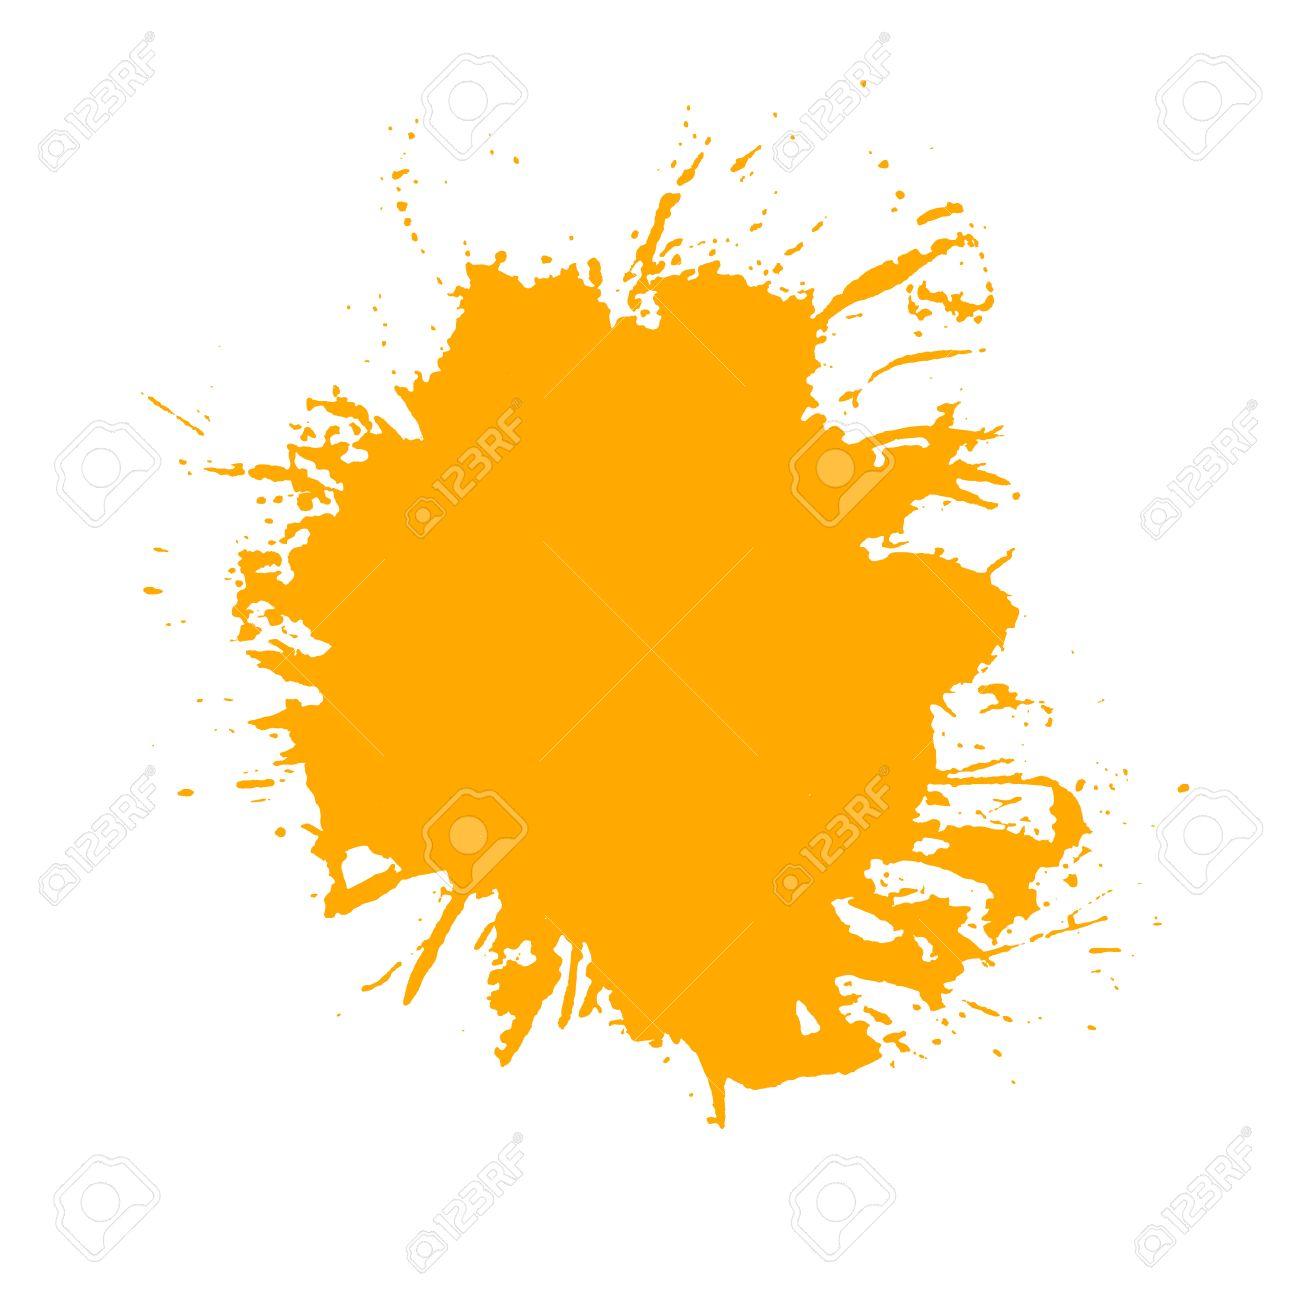 paint splash  Vector of brush strokes  Isolated on white background